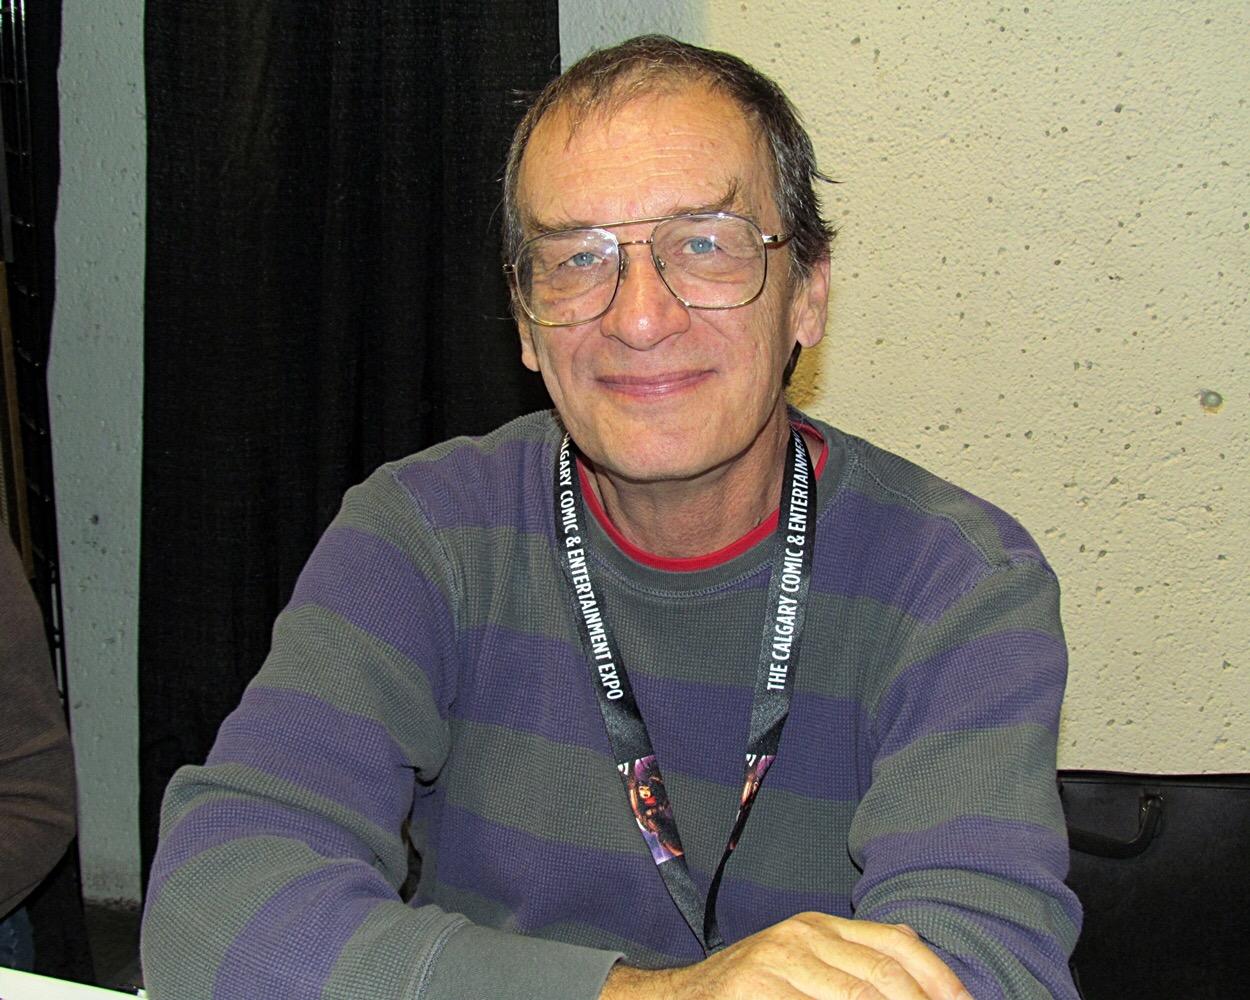 Bernie Wrightson